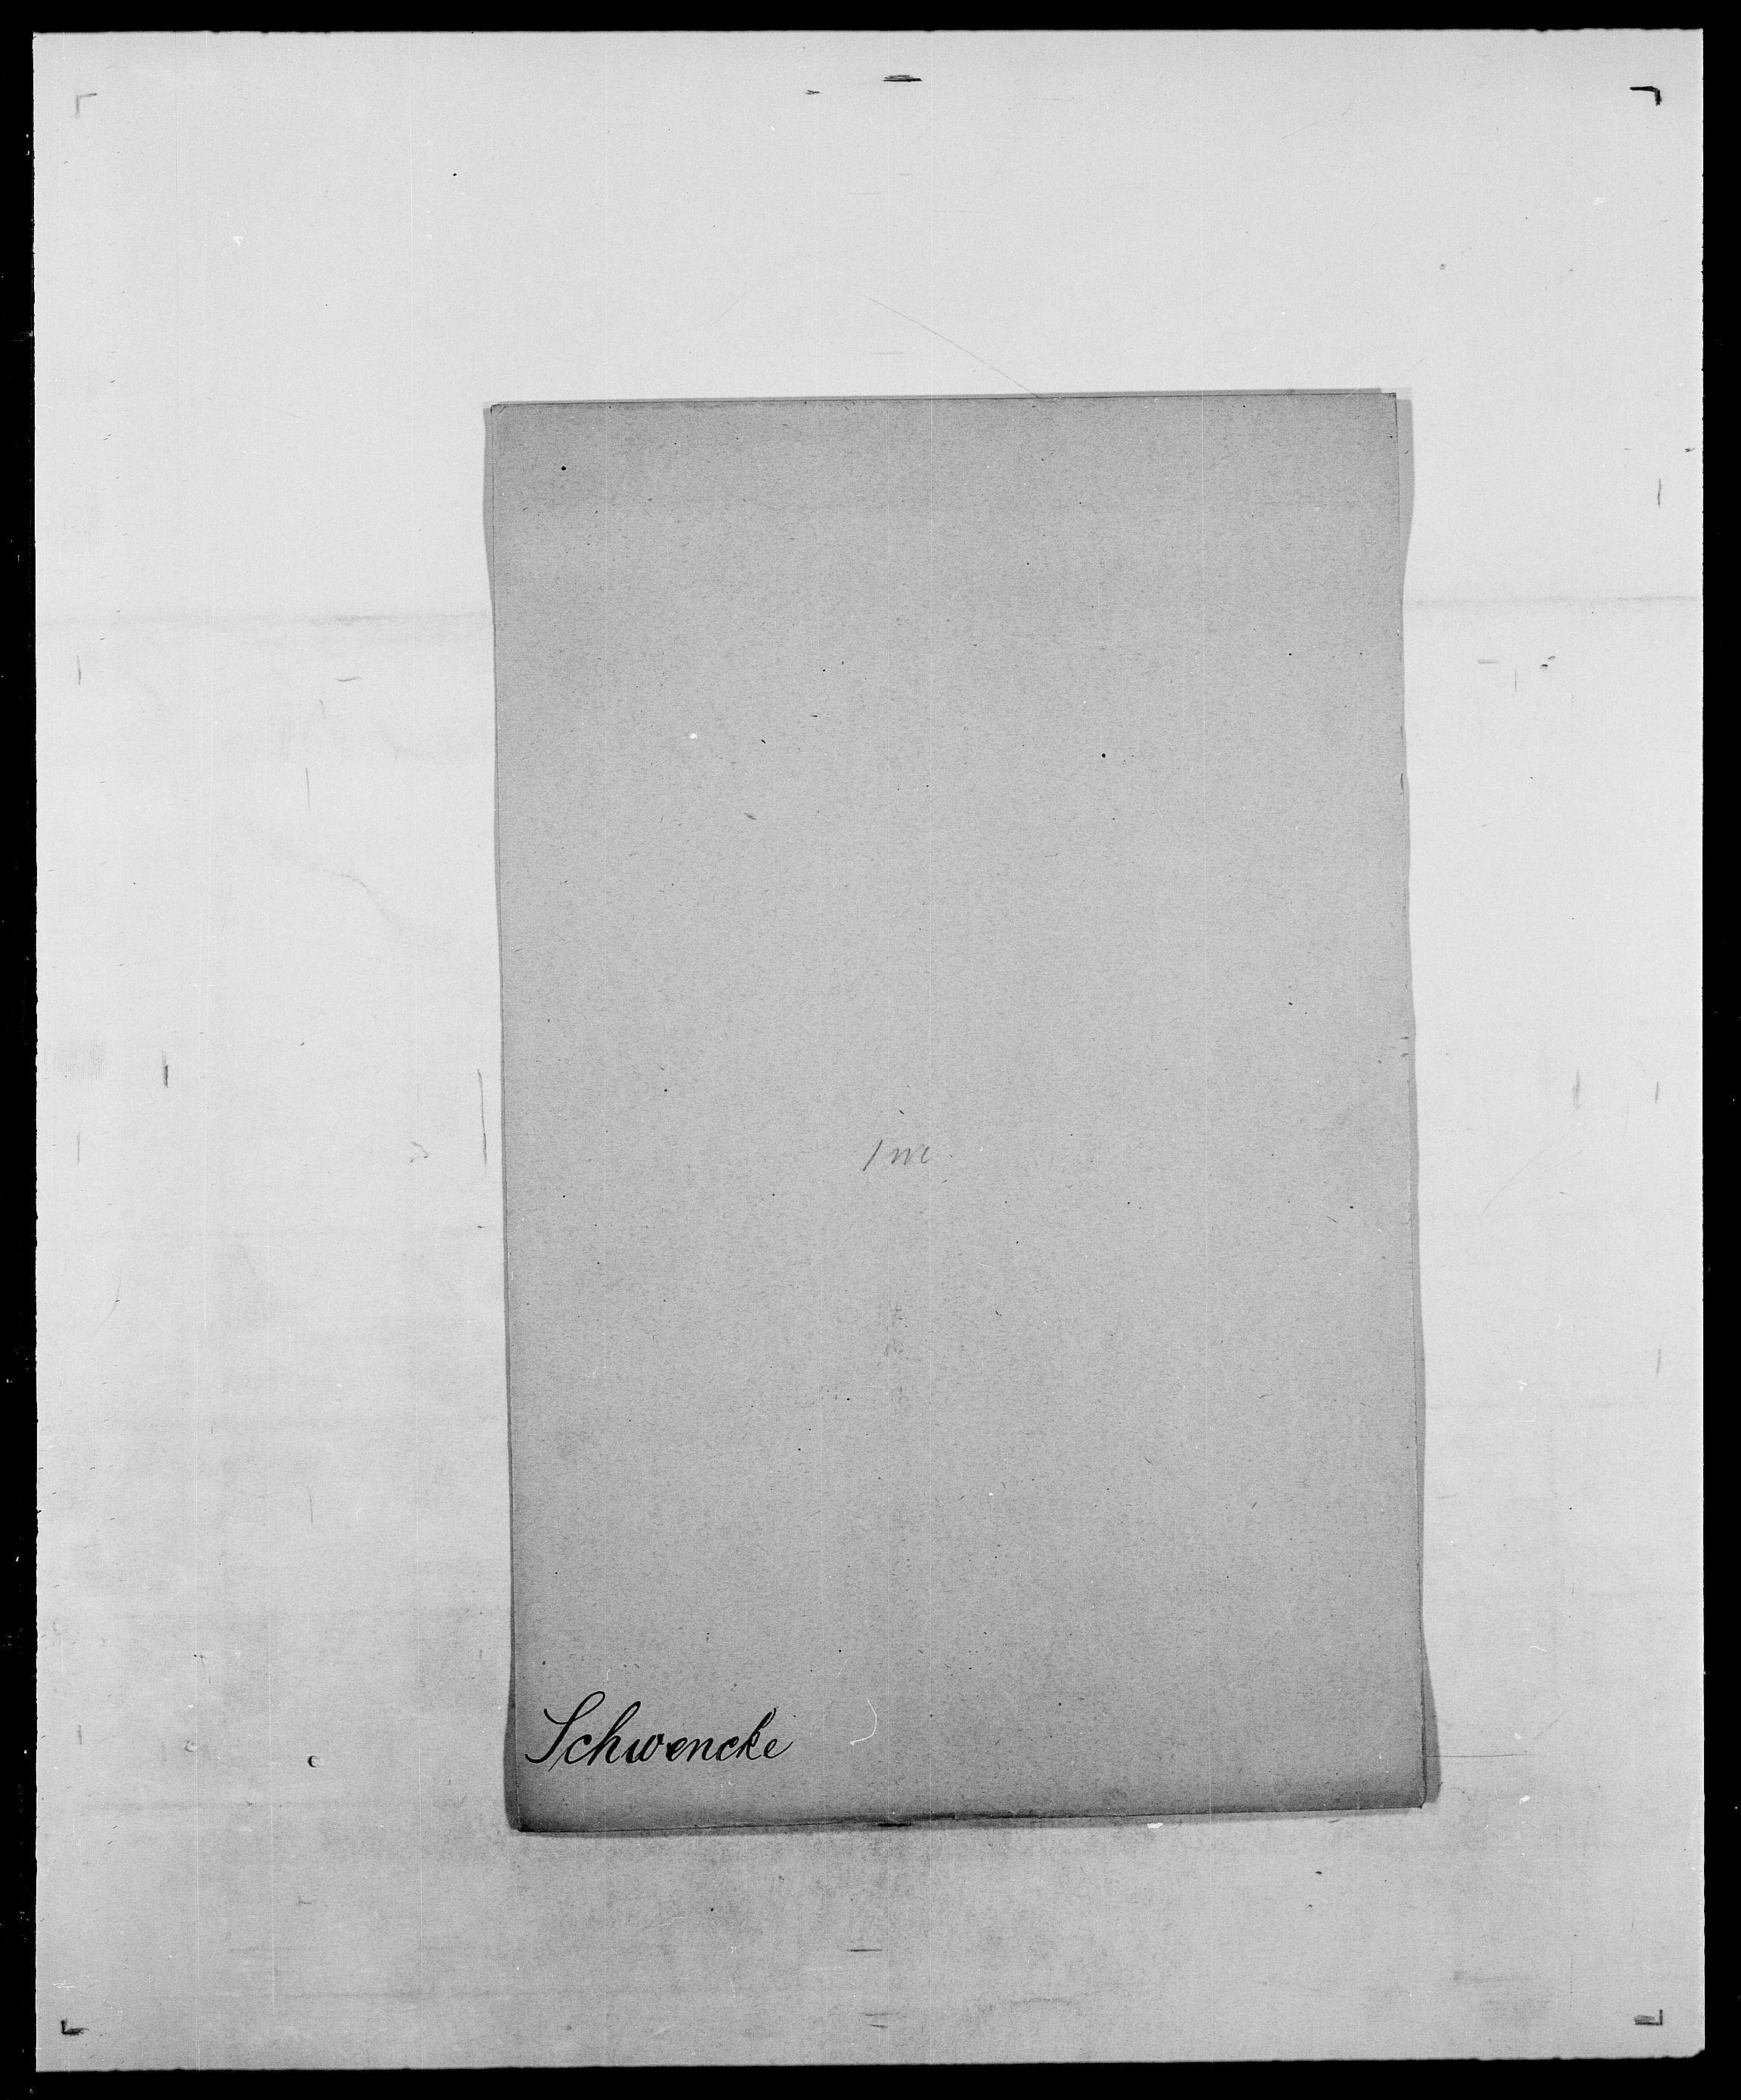 SAO, Delgobe, Charles Antoine - samling, D/Da/L0035: Schnabel - sjetman, s. 410